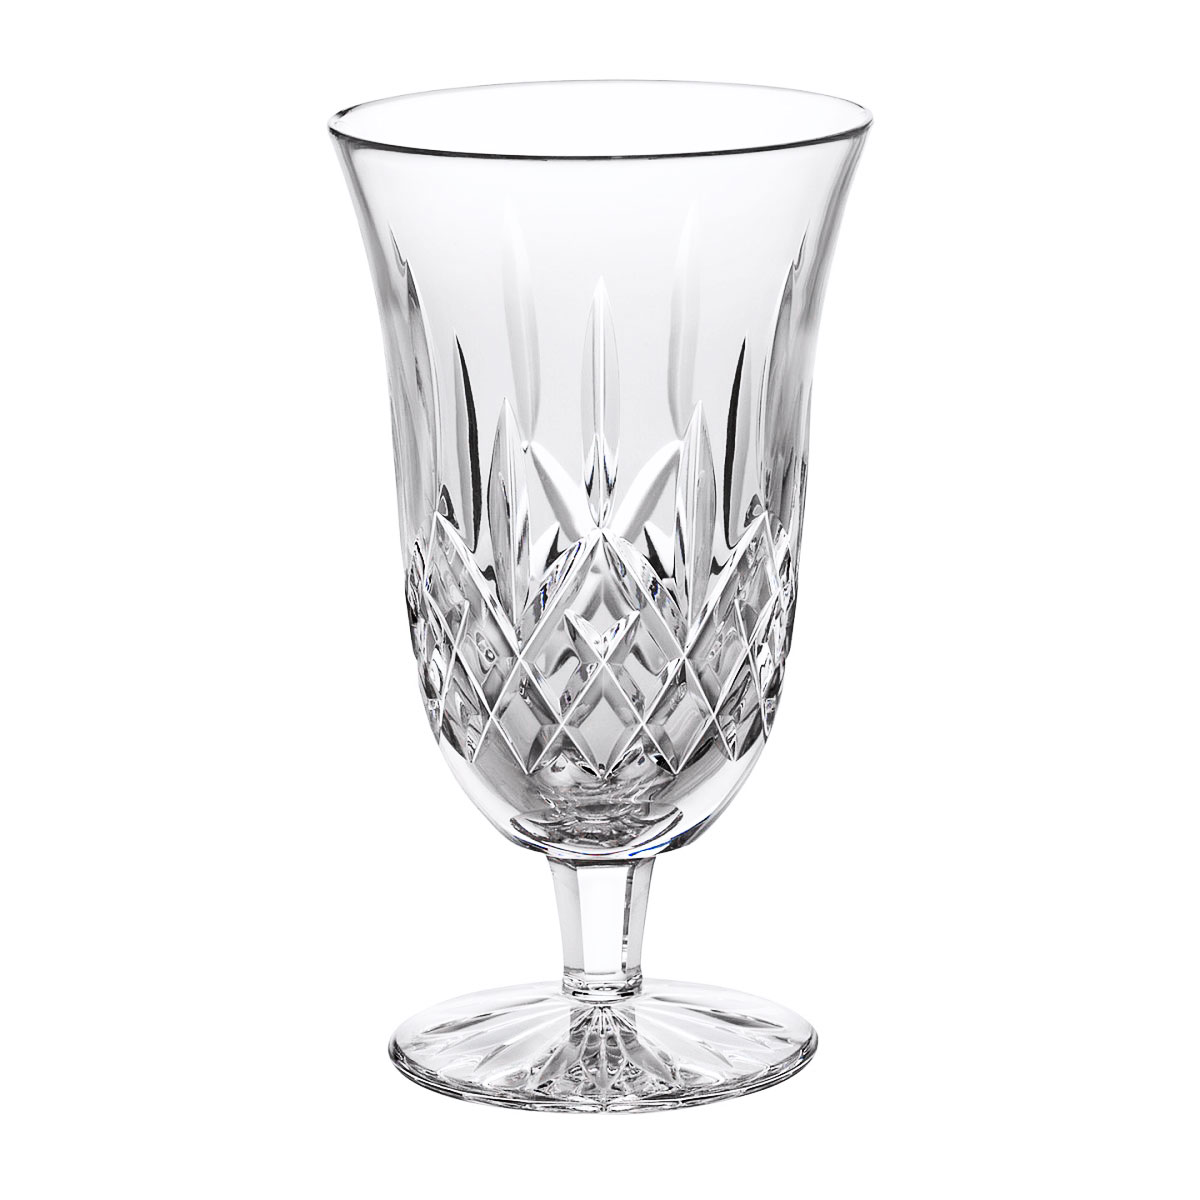 Waterford Crystal, Lismore Footed Crystal Iced Beverage, Single